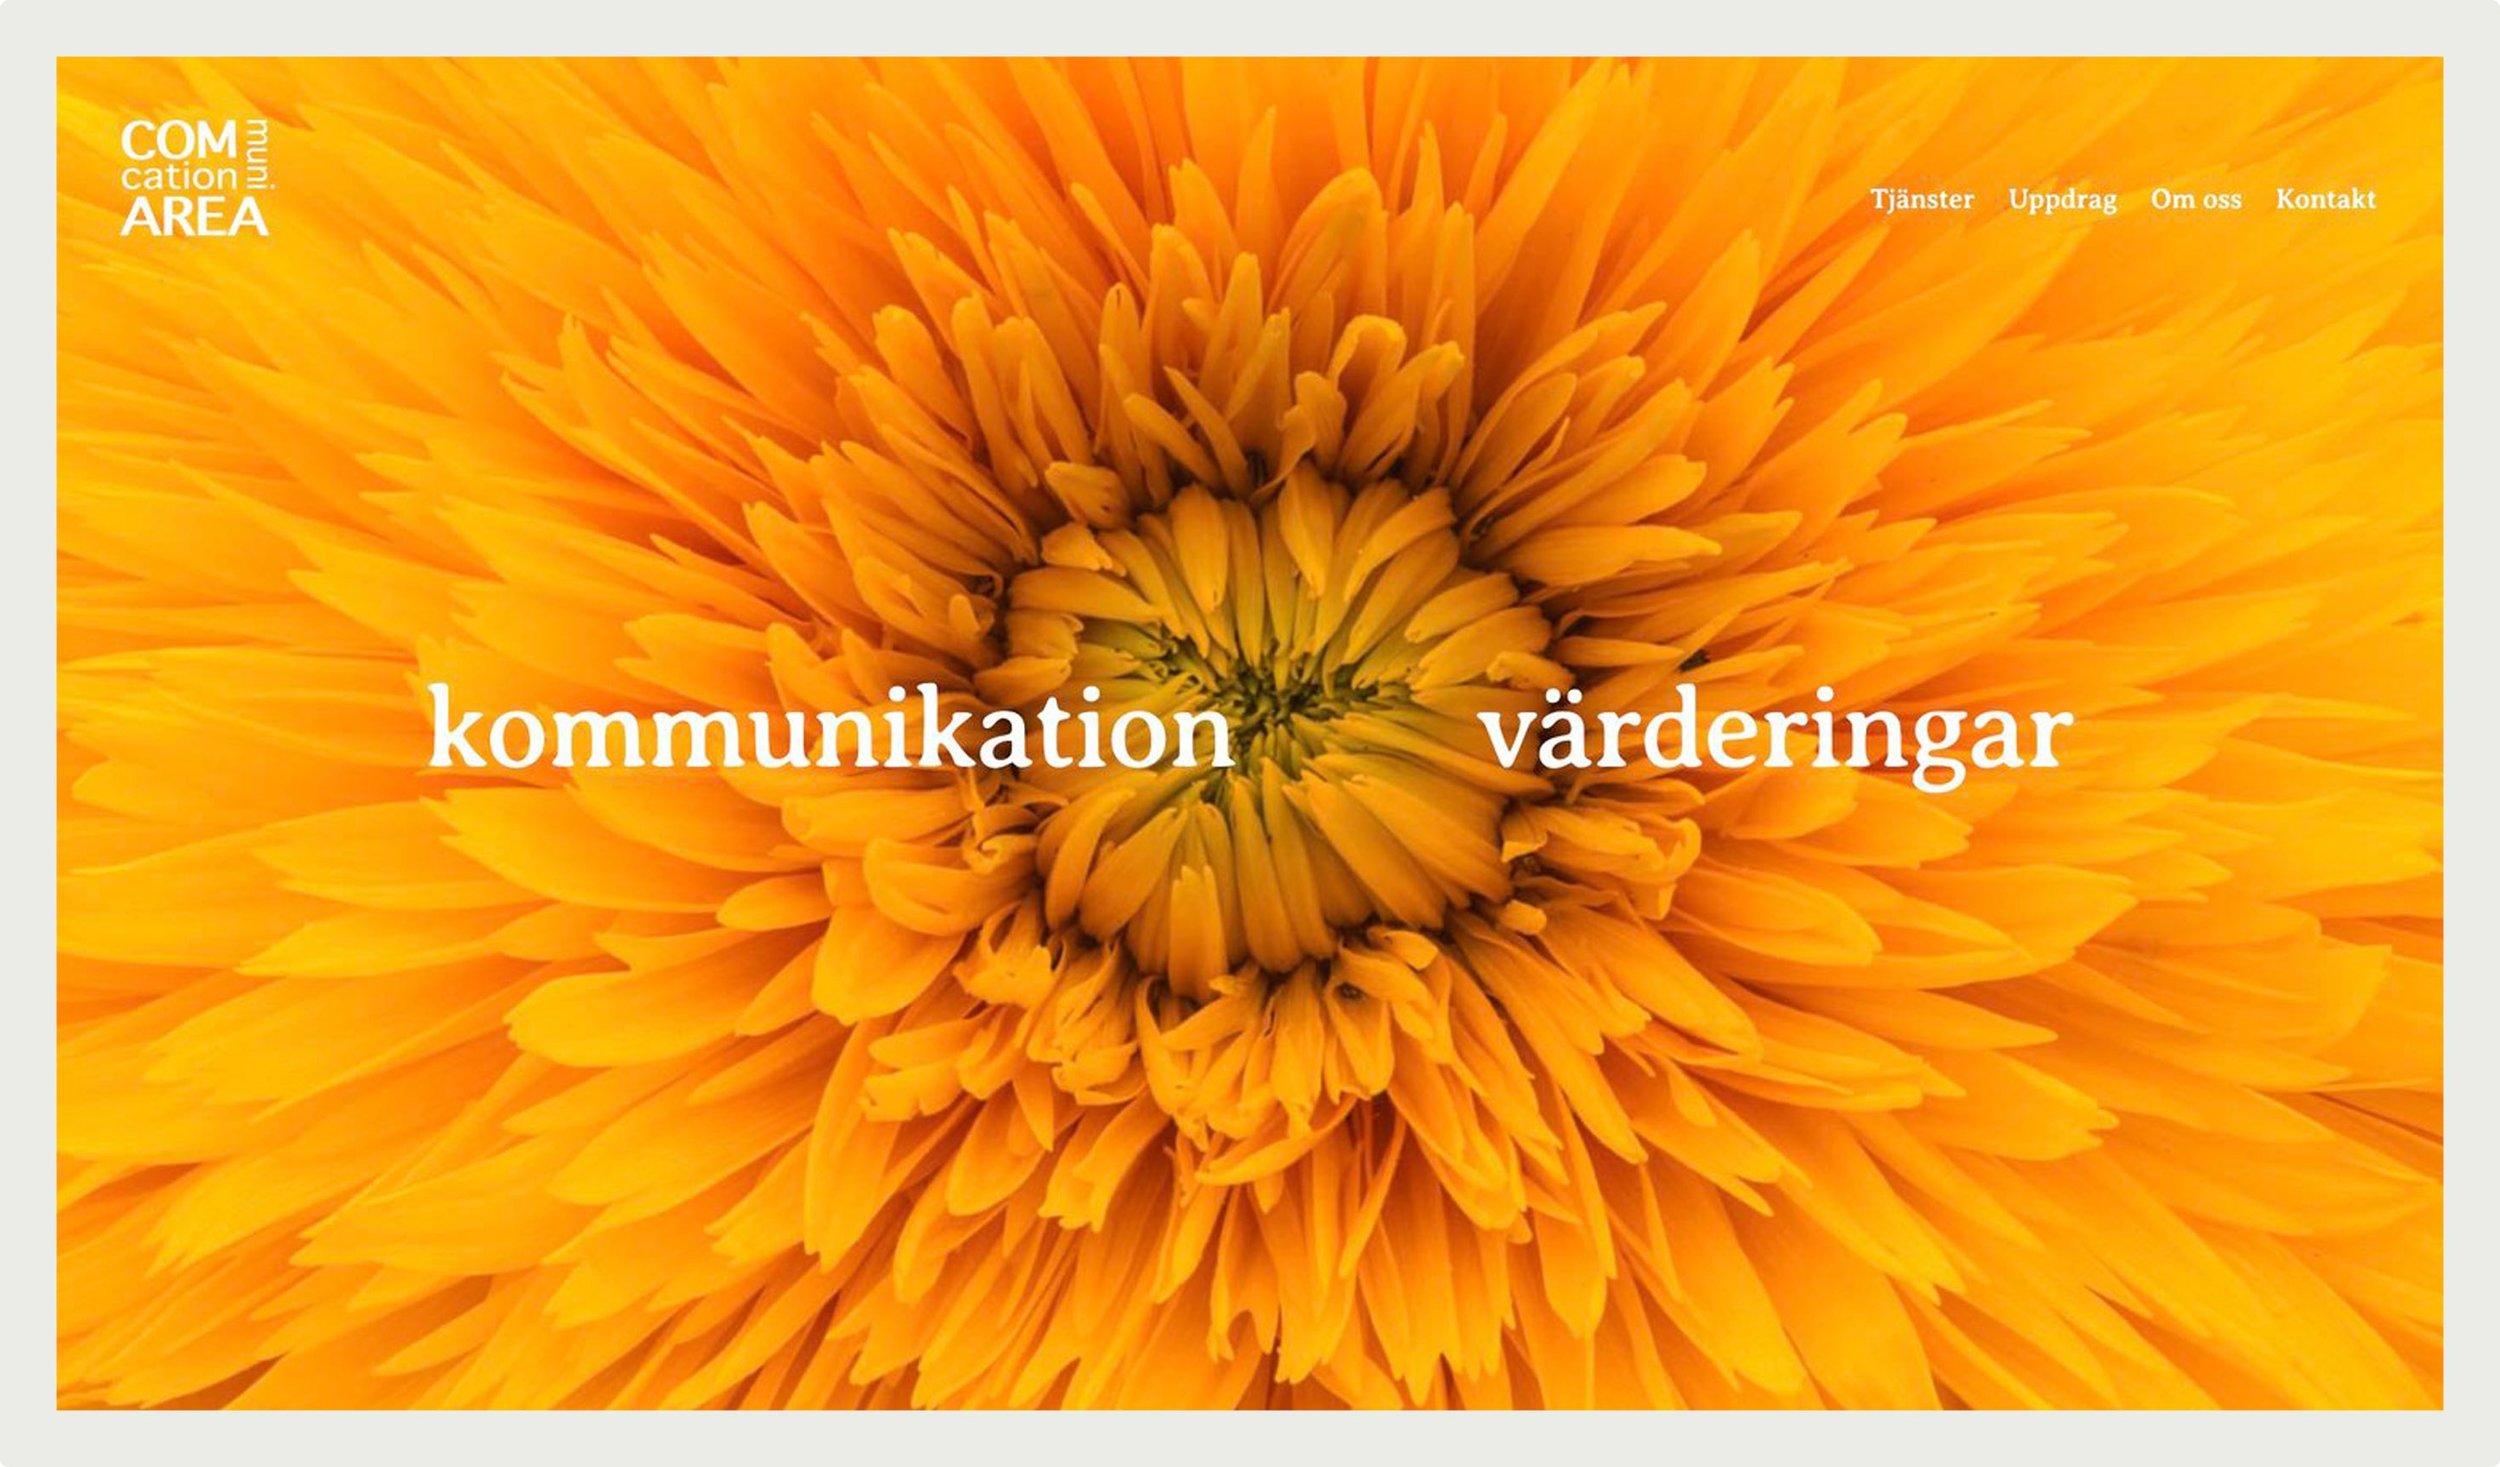 communication-aera-6-1.jpg